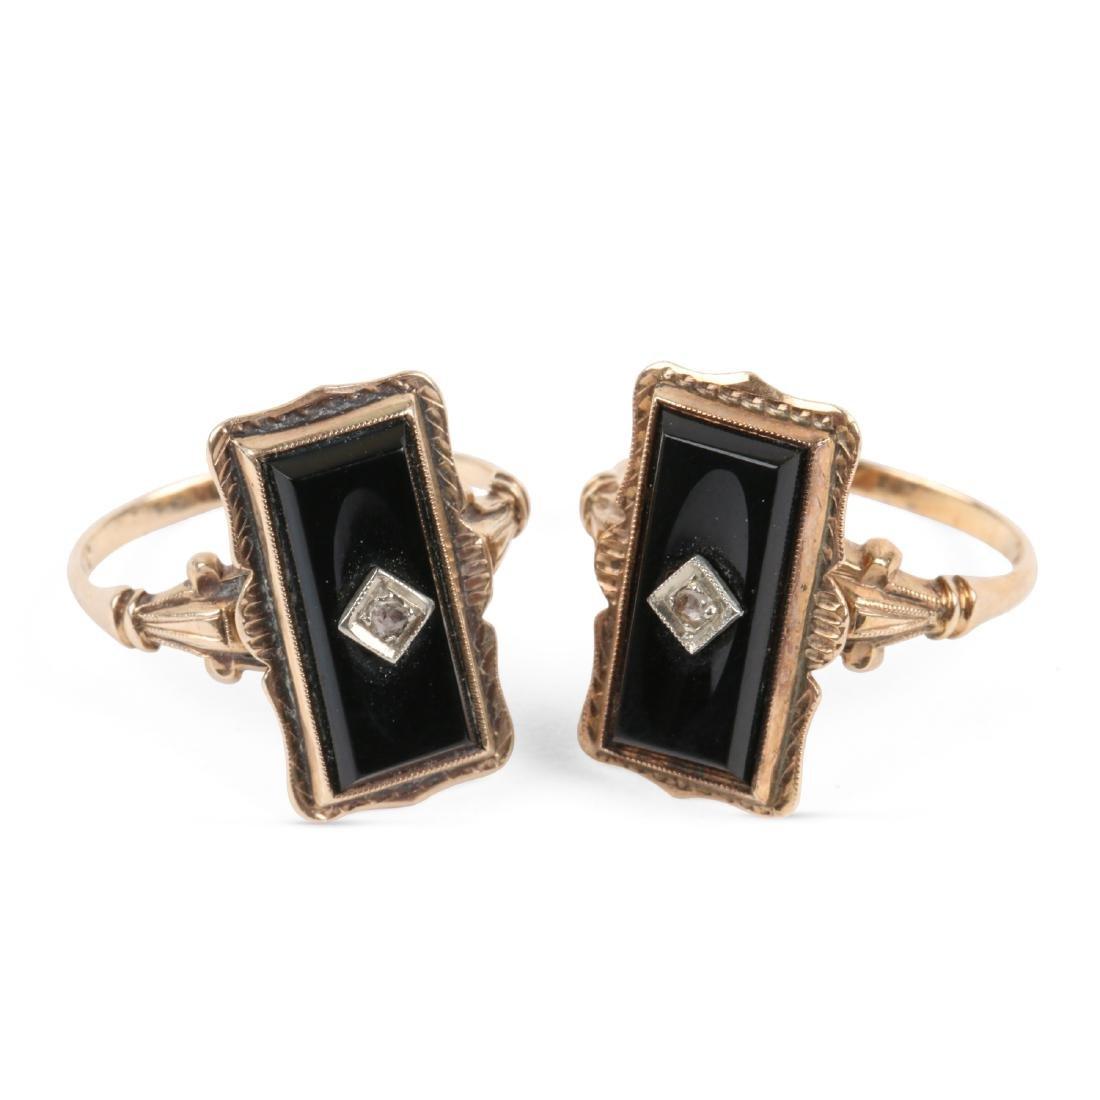 A Pair, 10K Gold & Onyx Rings